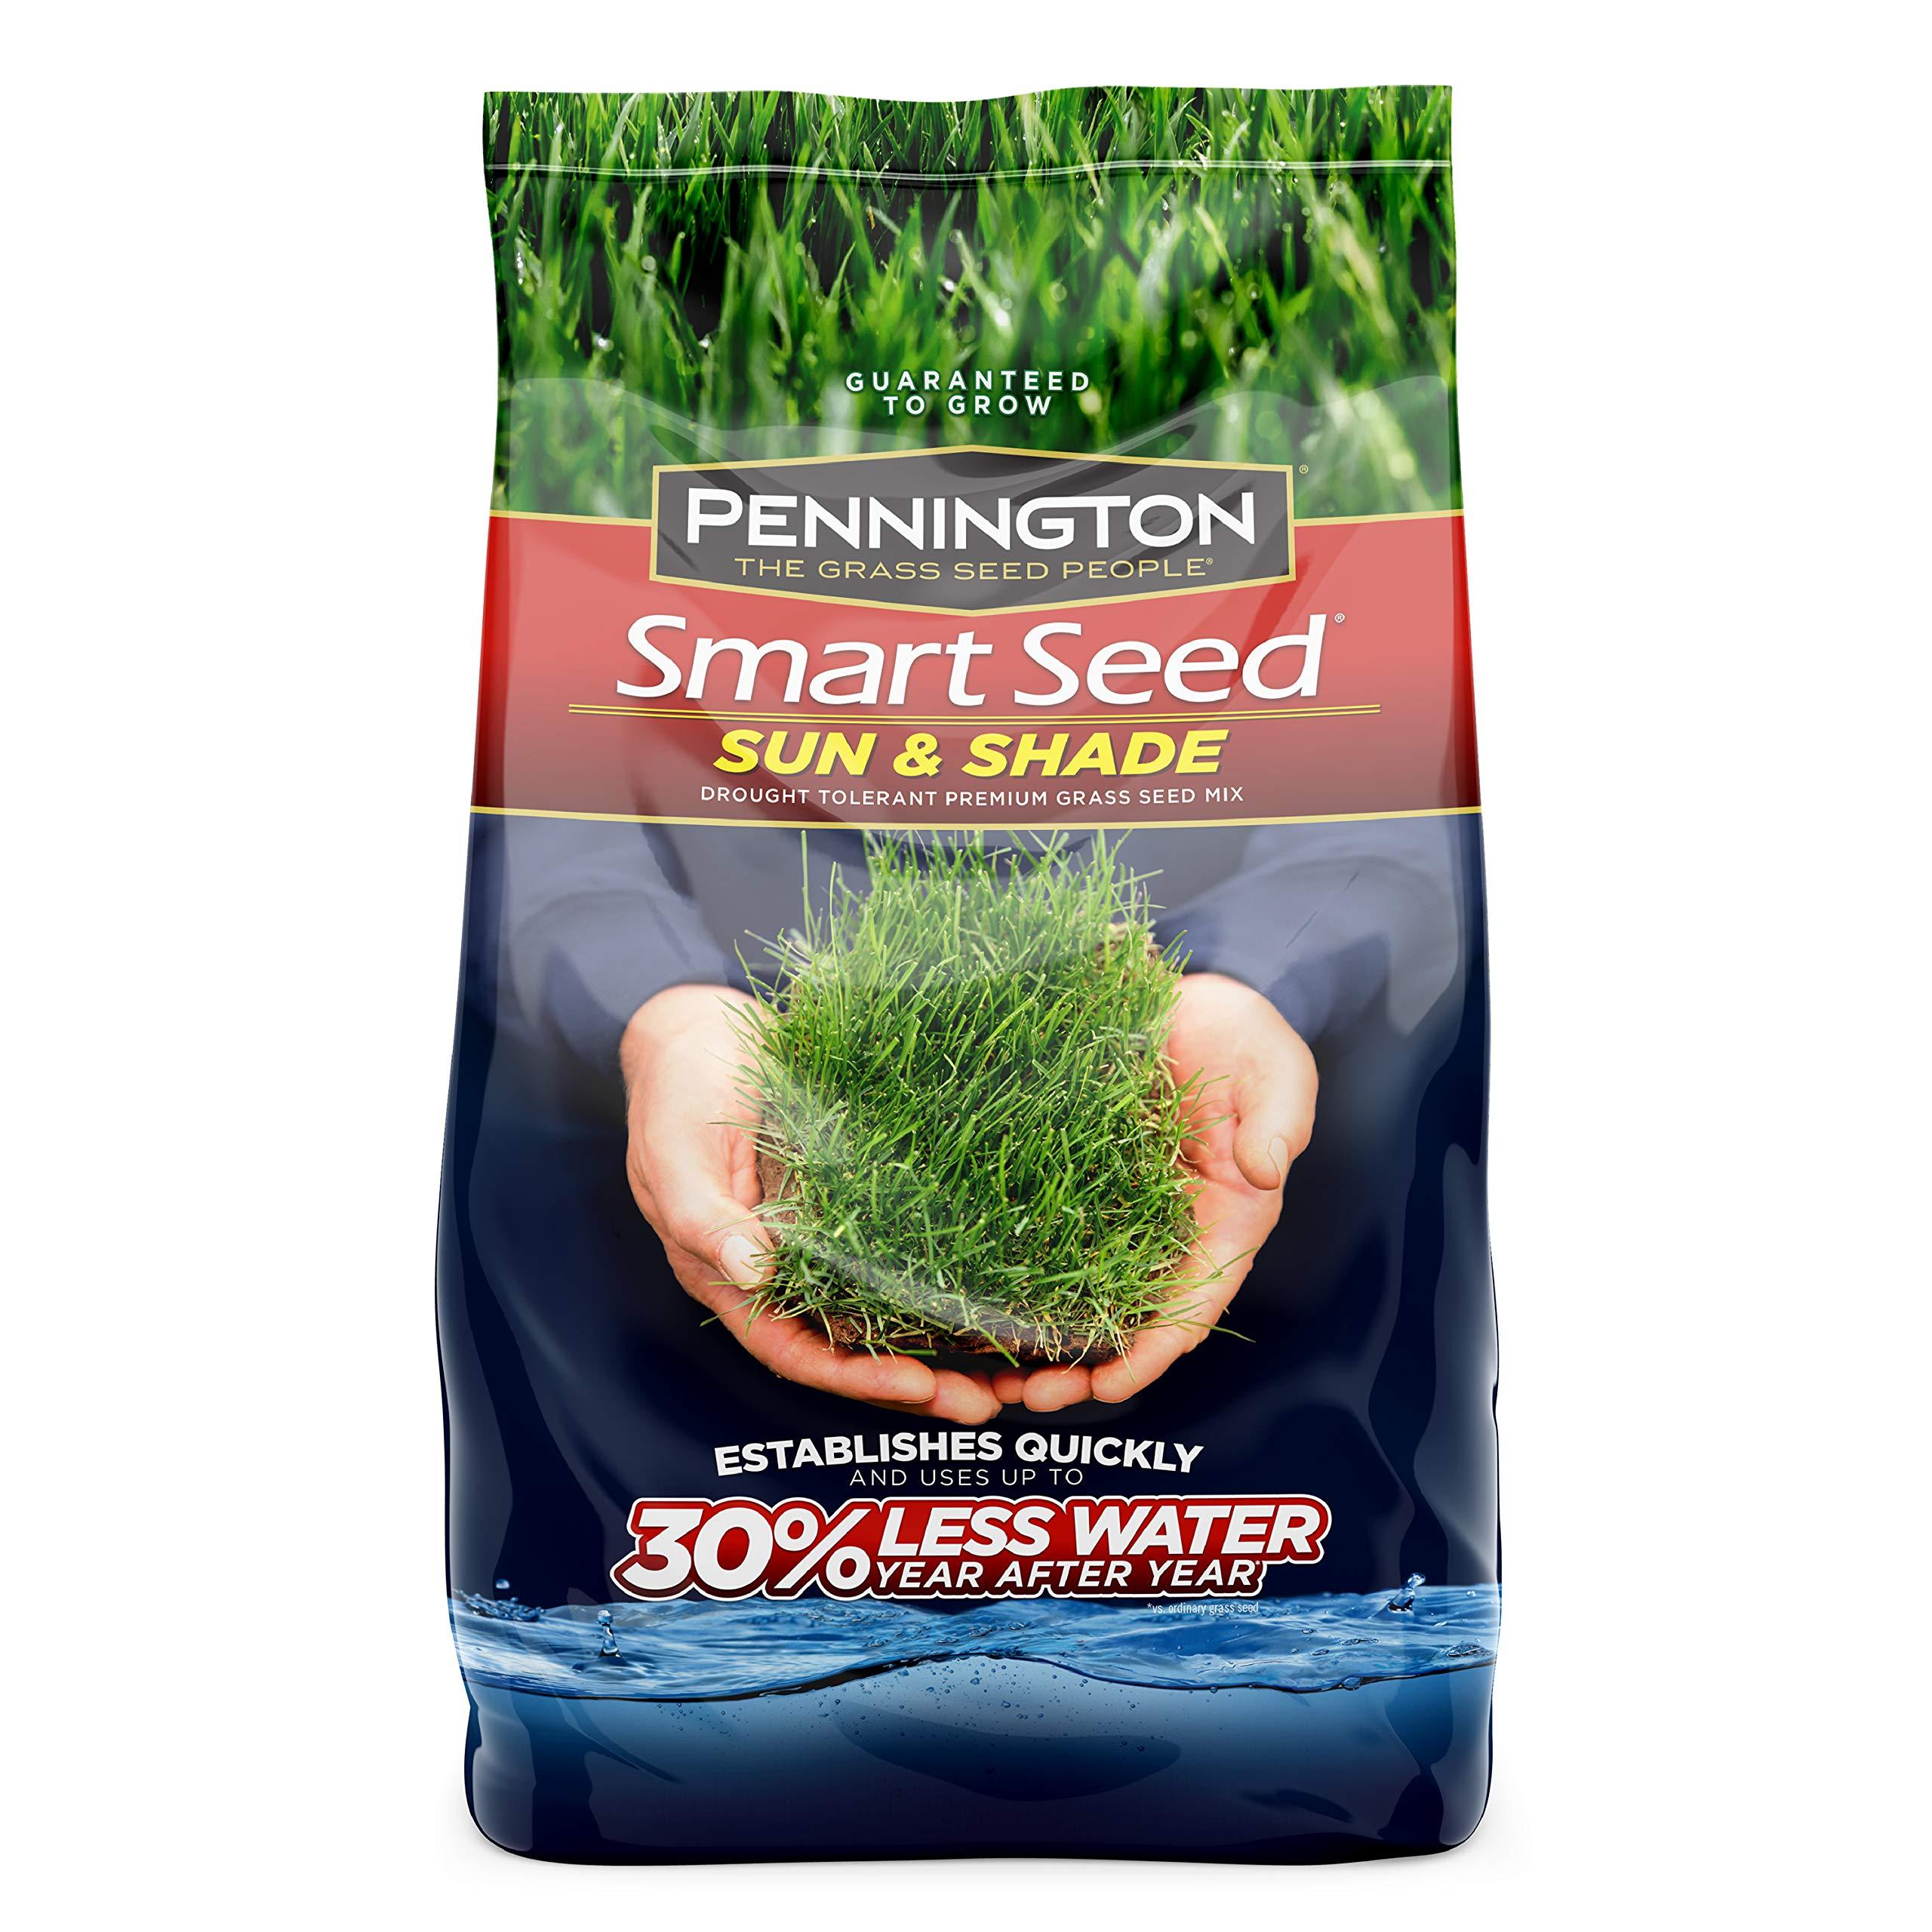 Pennington 100526671 Smart Seed Sun and Shade Grass Seed, 7 LBS by Pennington